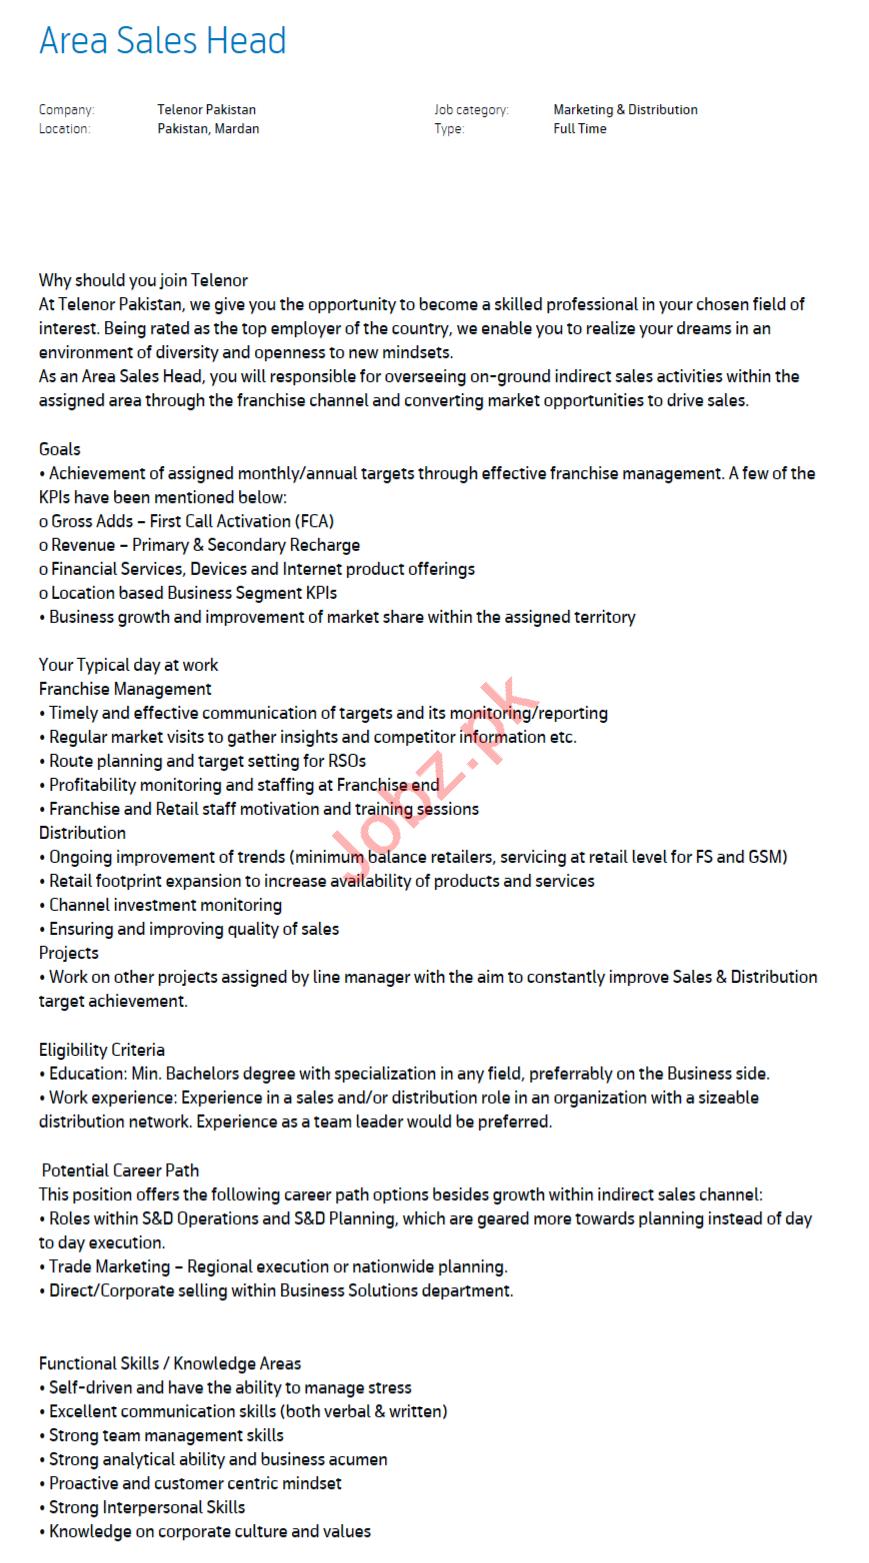 Area Sales Head Jobs 2020 in Telenor Mardan